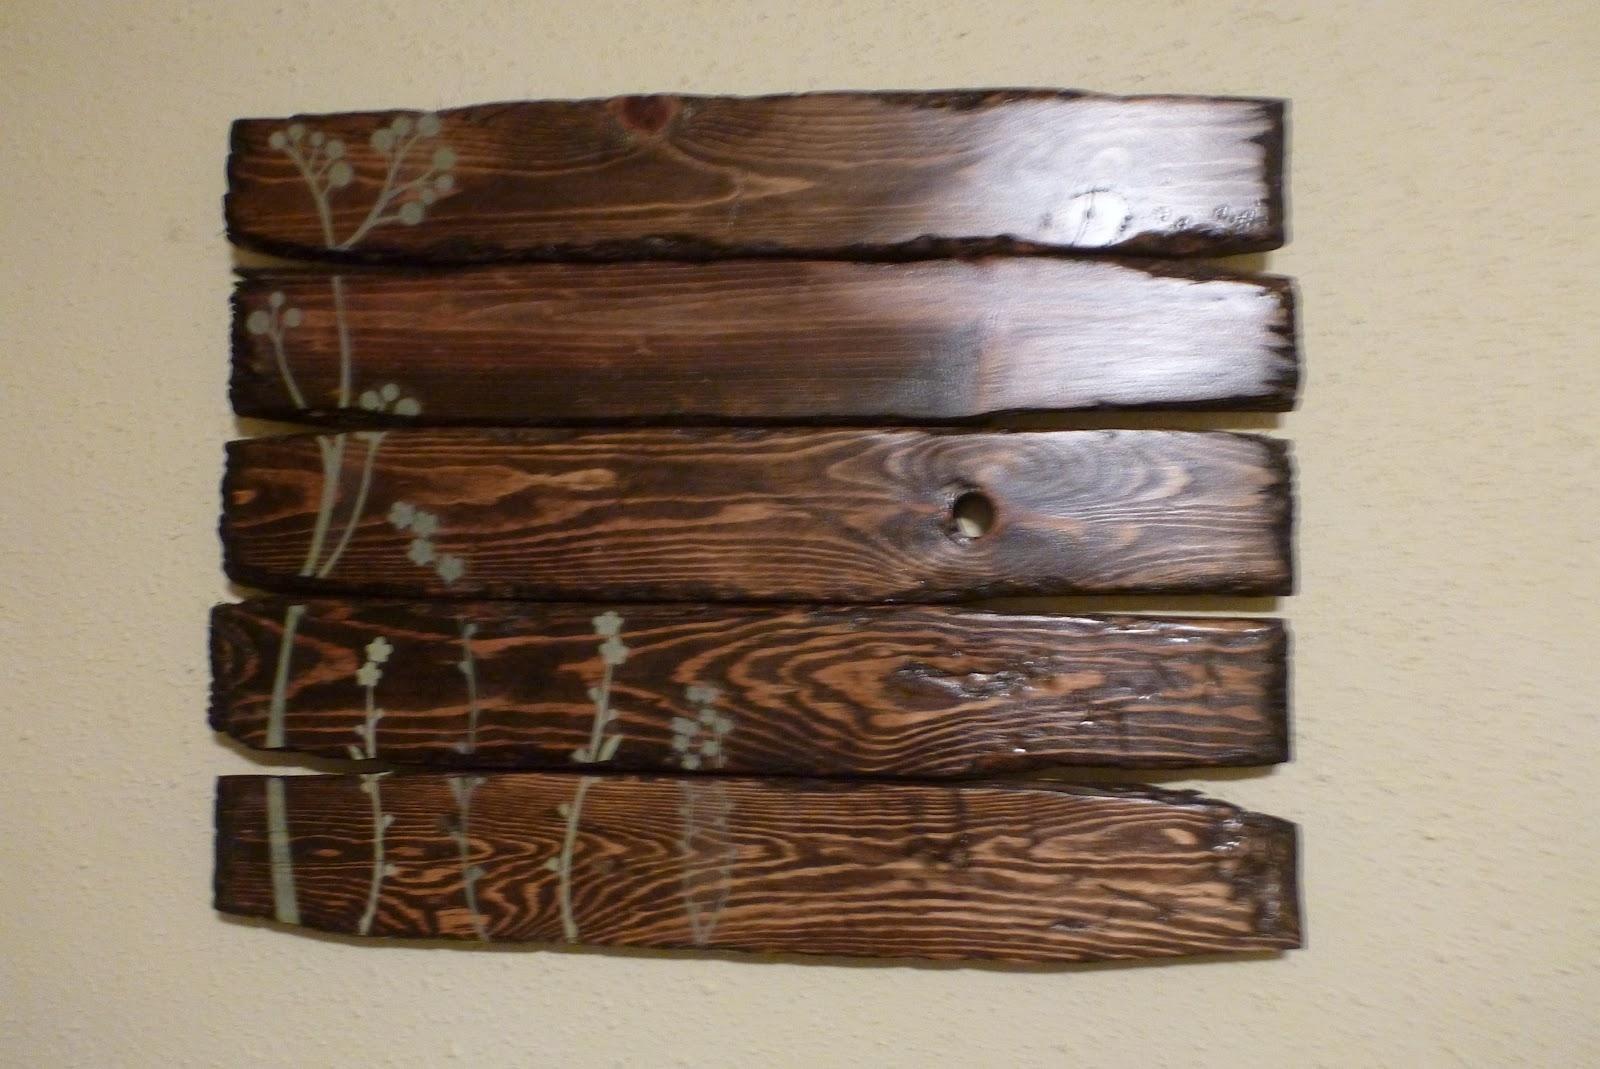 Handmade Mayhem: Reclaimed Wood Wall Art Pertaining To Best And Newest Reclaimed Wood Wall Art (View 5 of 15)